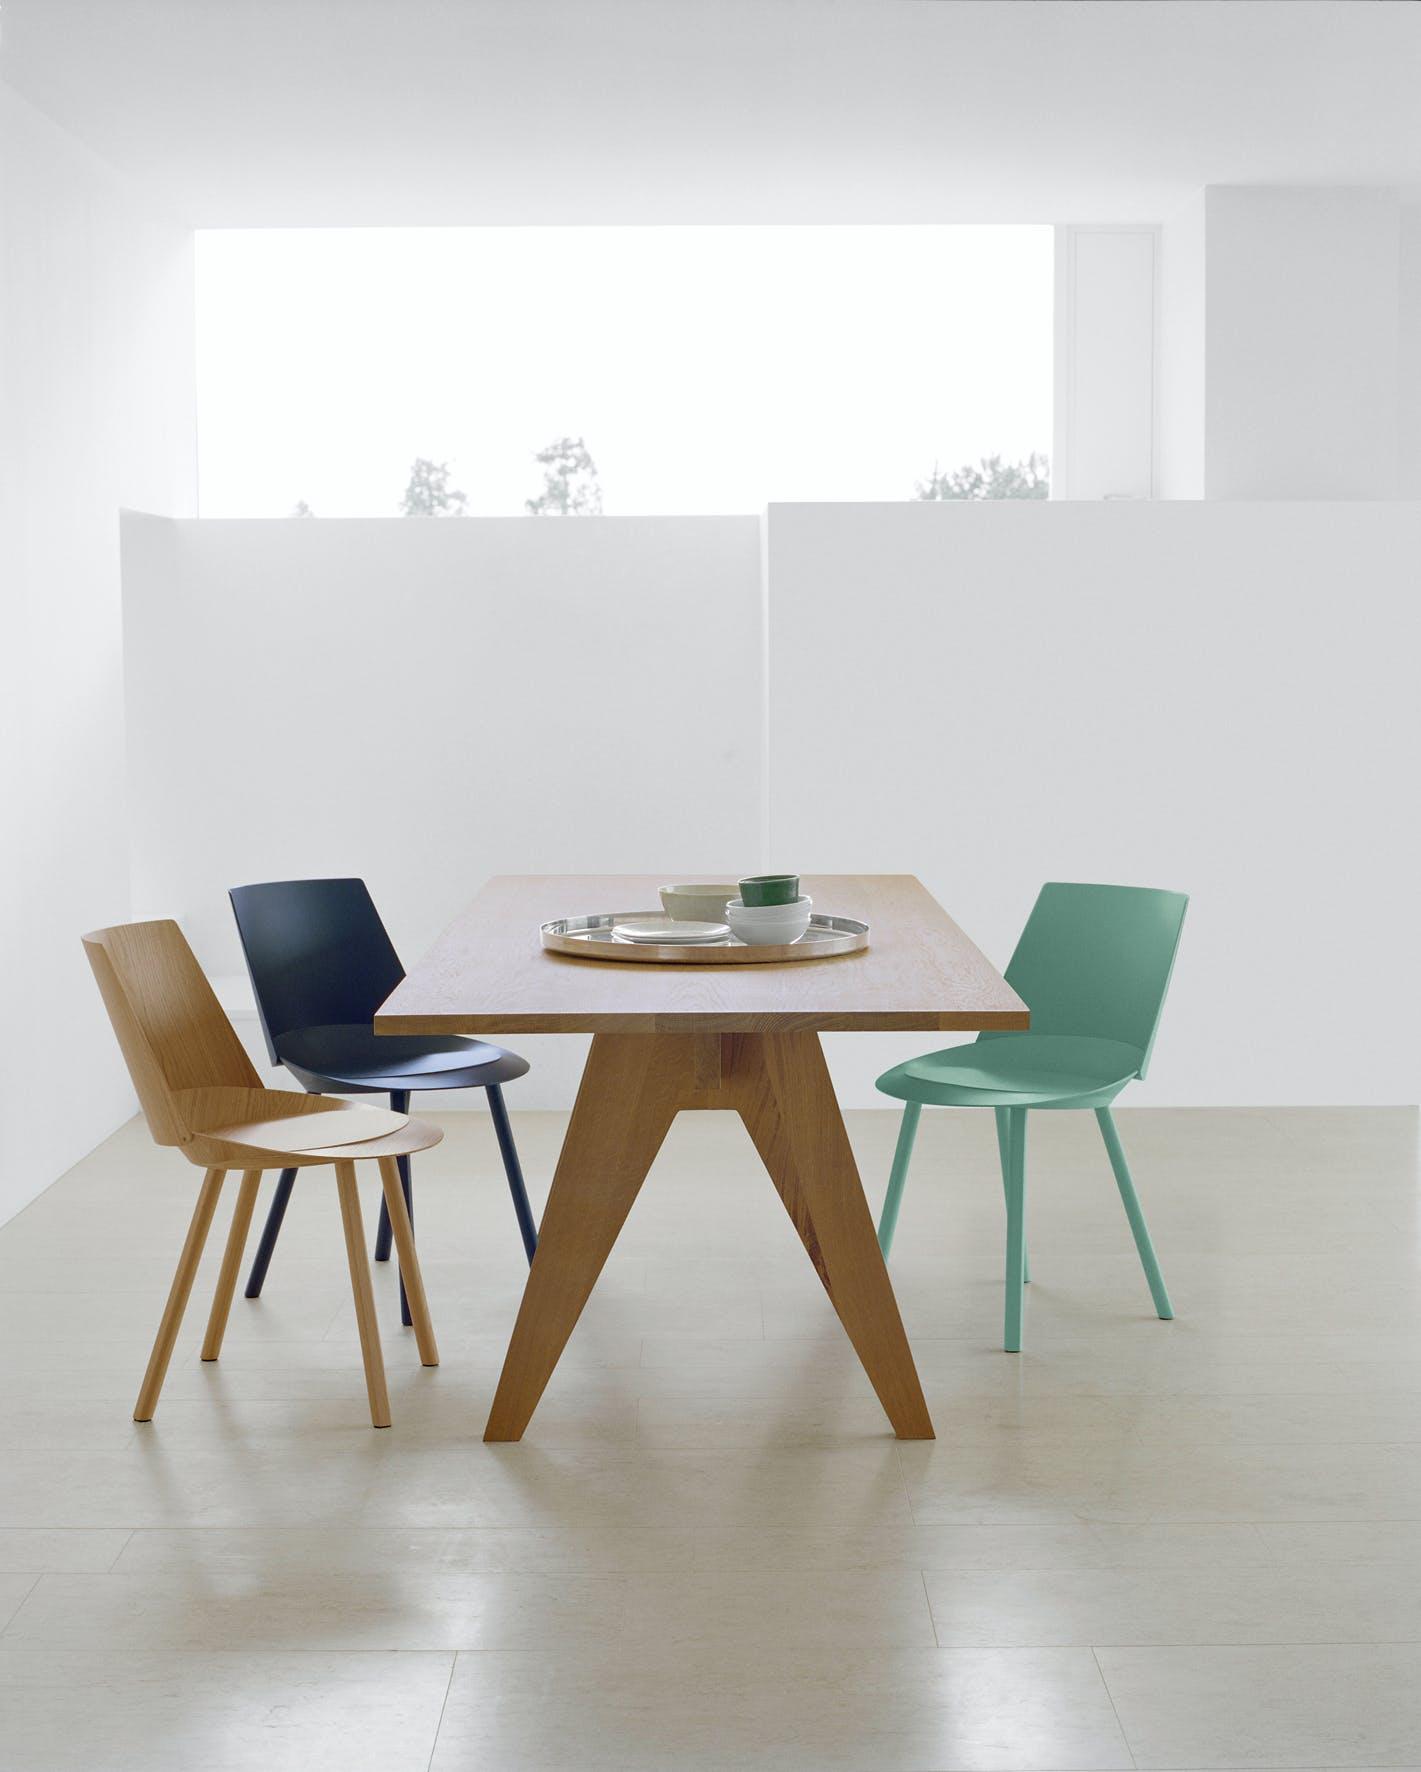 E15-furniture-alden-table-turquoise-chair-haute-living